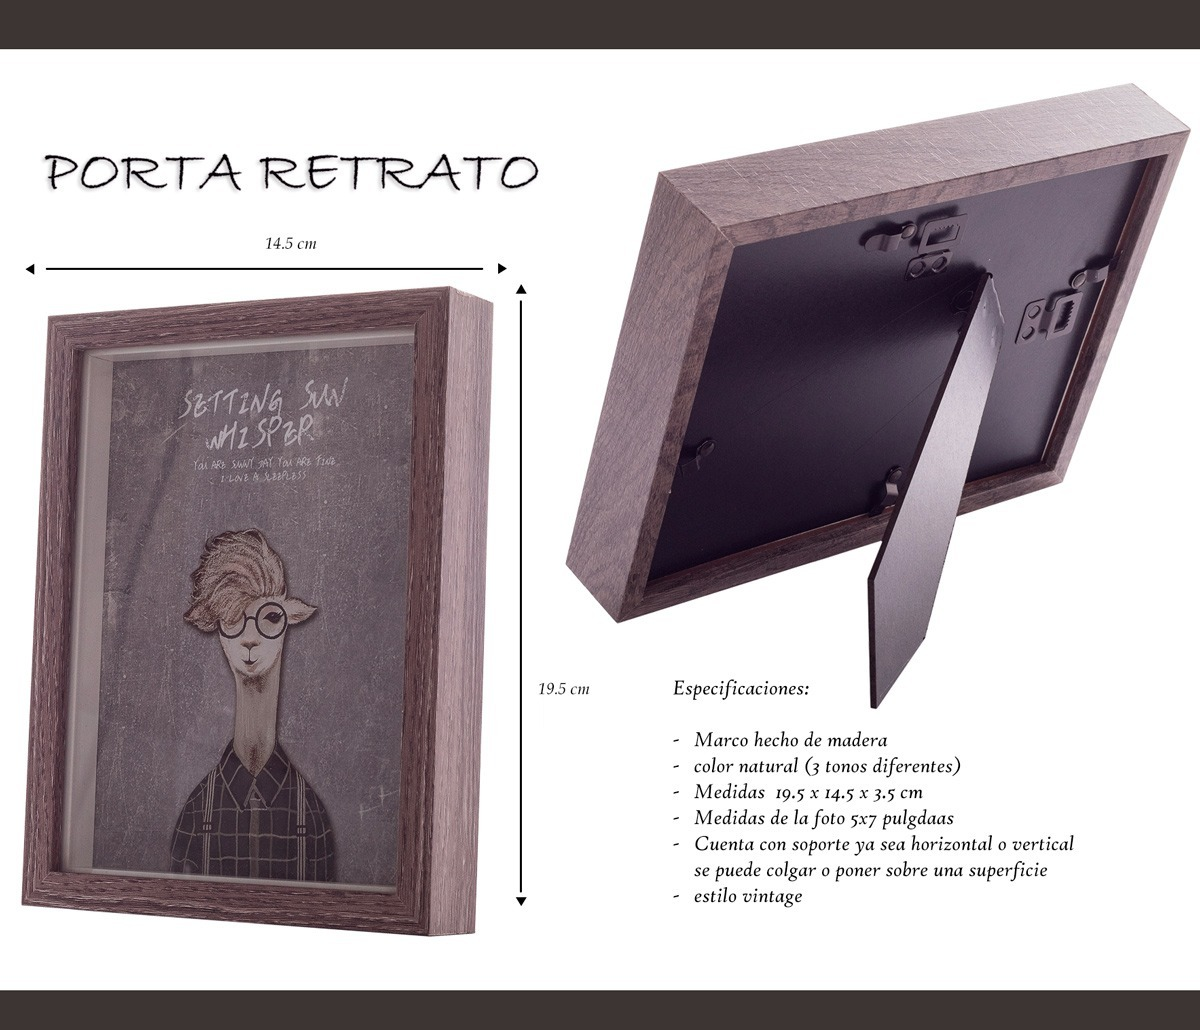 12 Juegos De 4 Portaretratos De Madera M002 Hogar Regalo ...